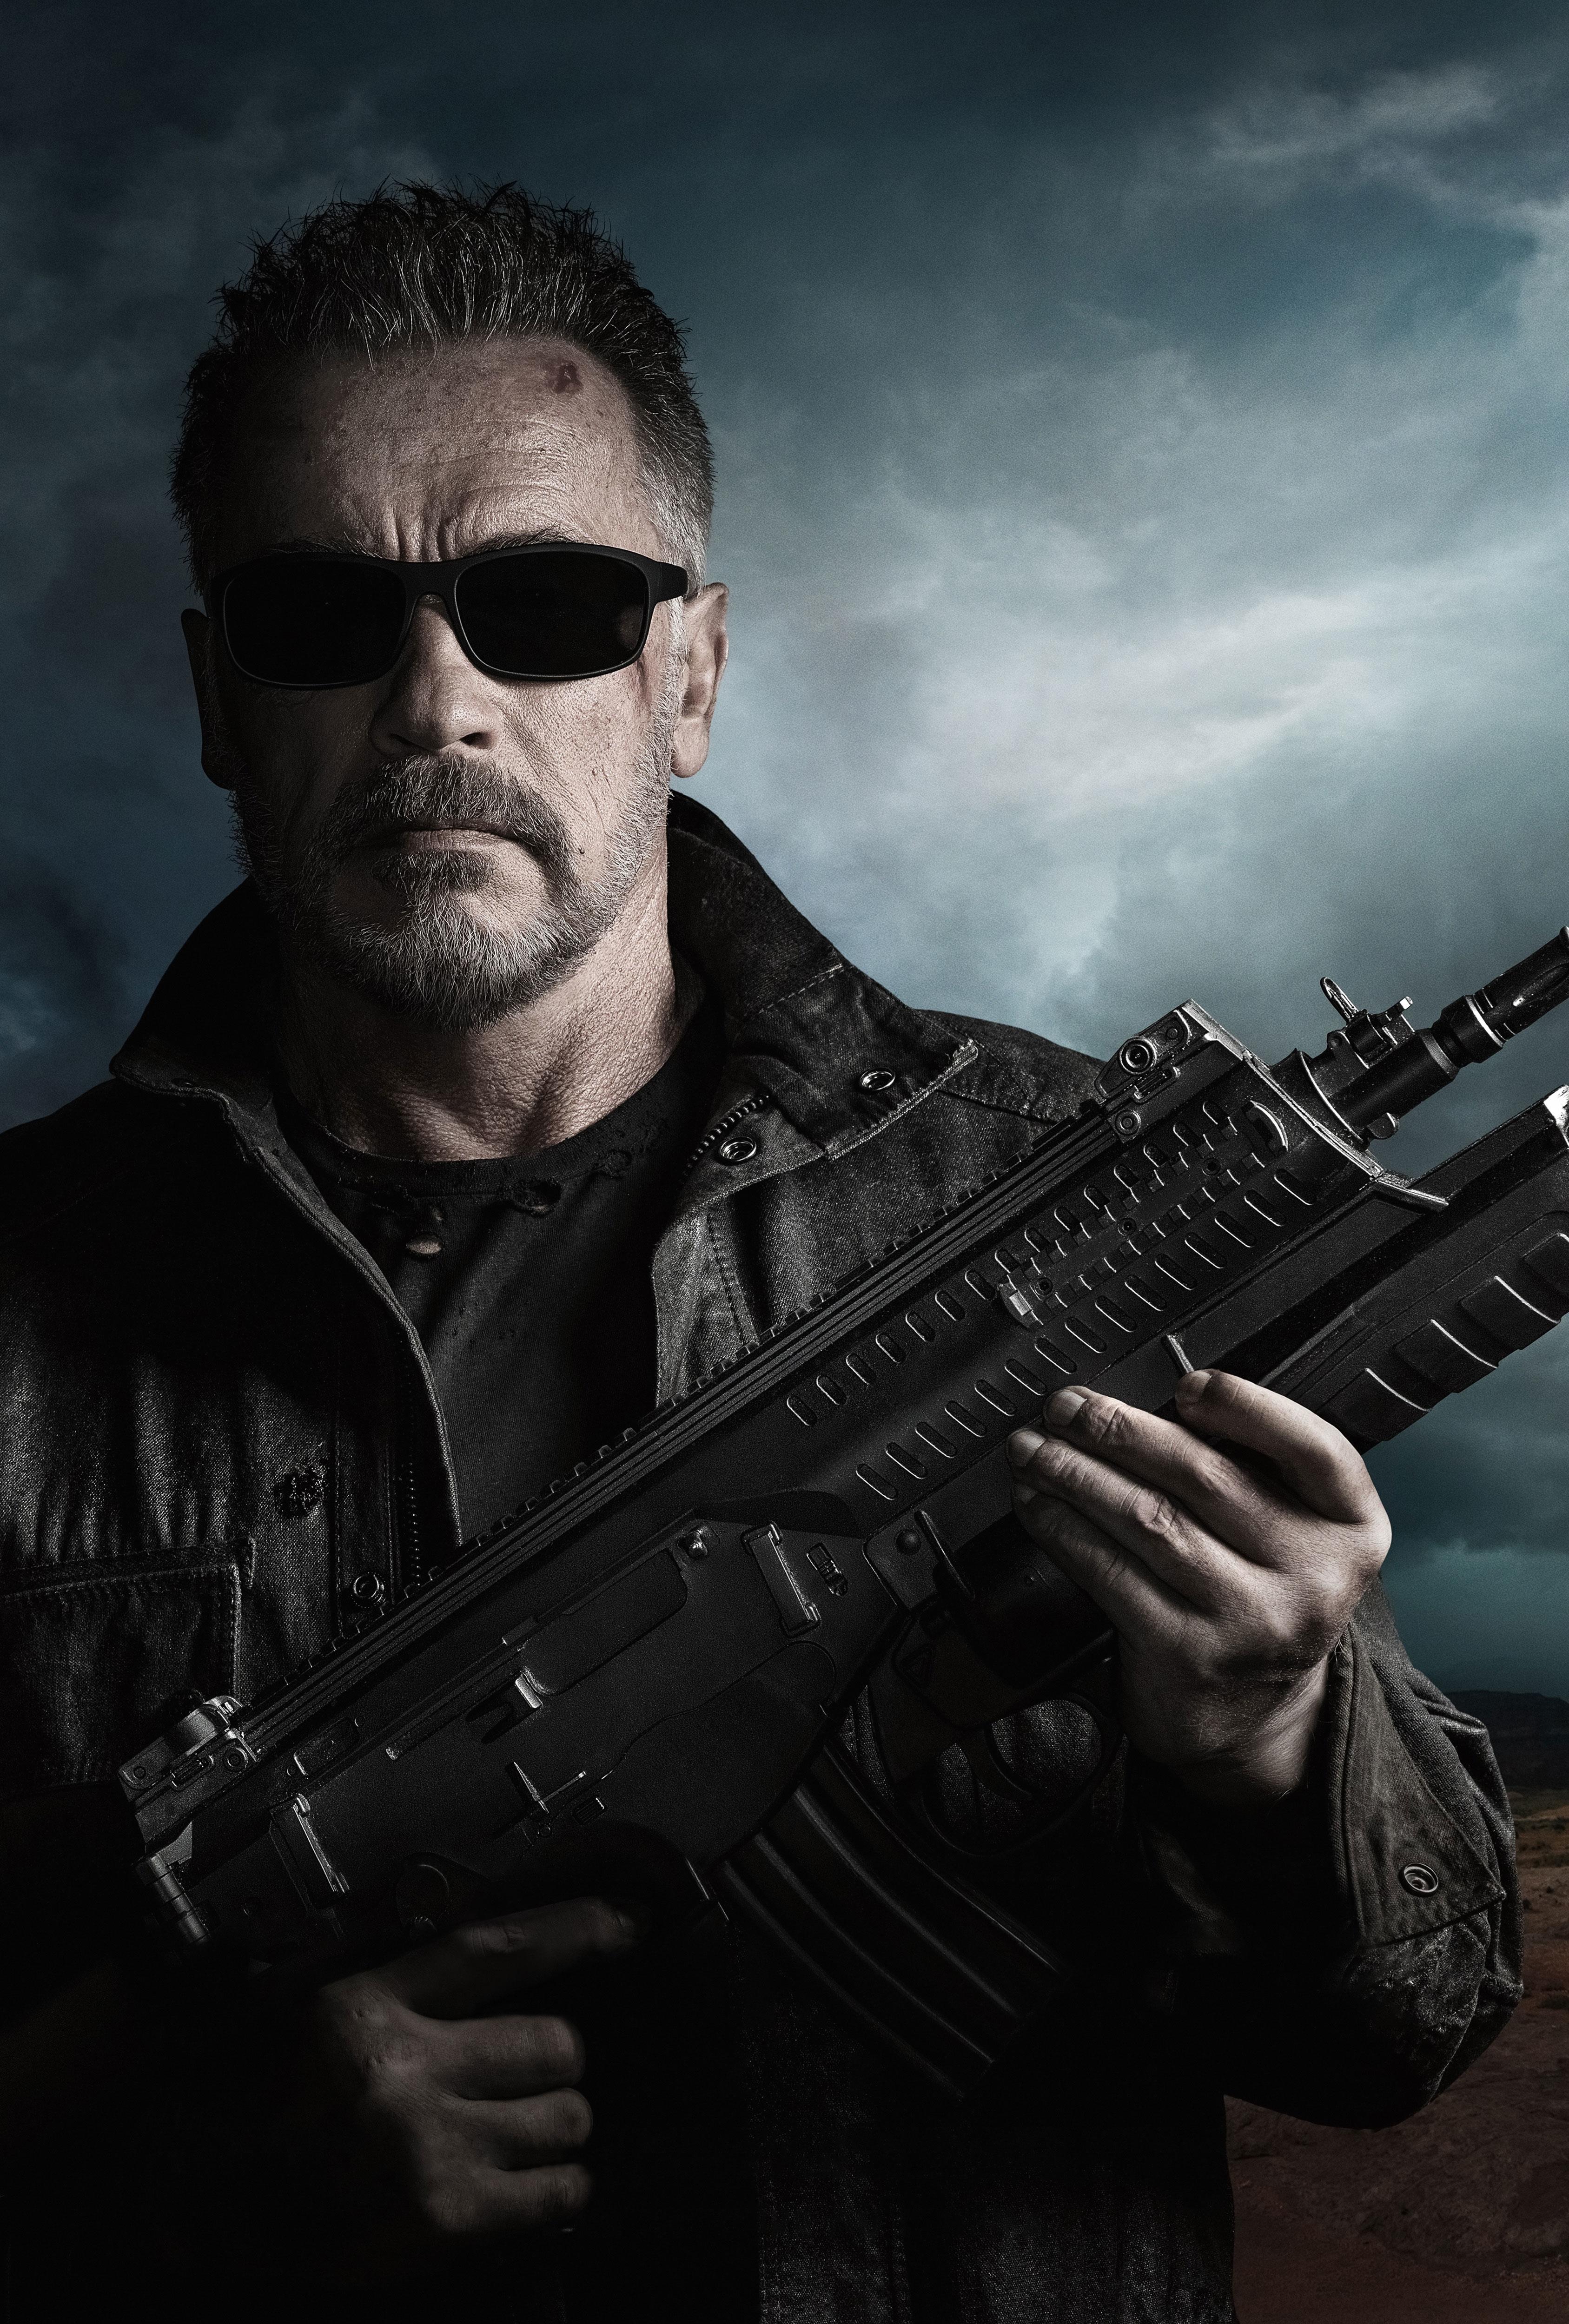 Terminator 6 Movie 4K Wallpaper, HD